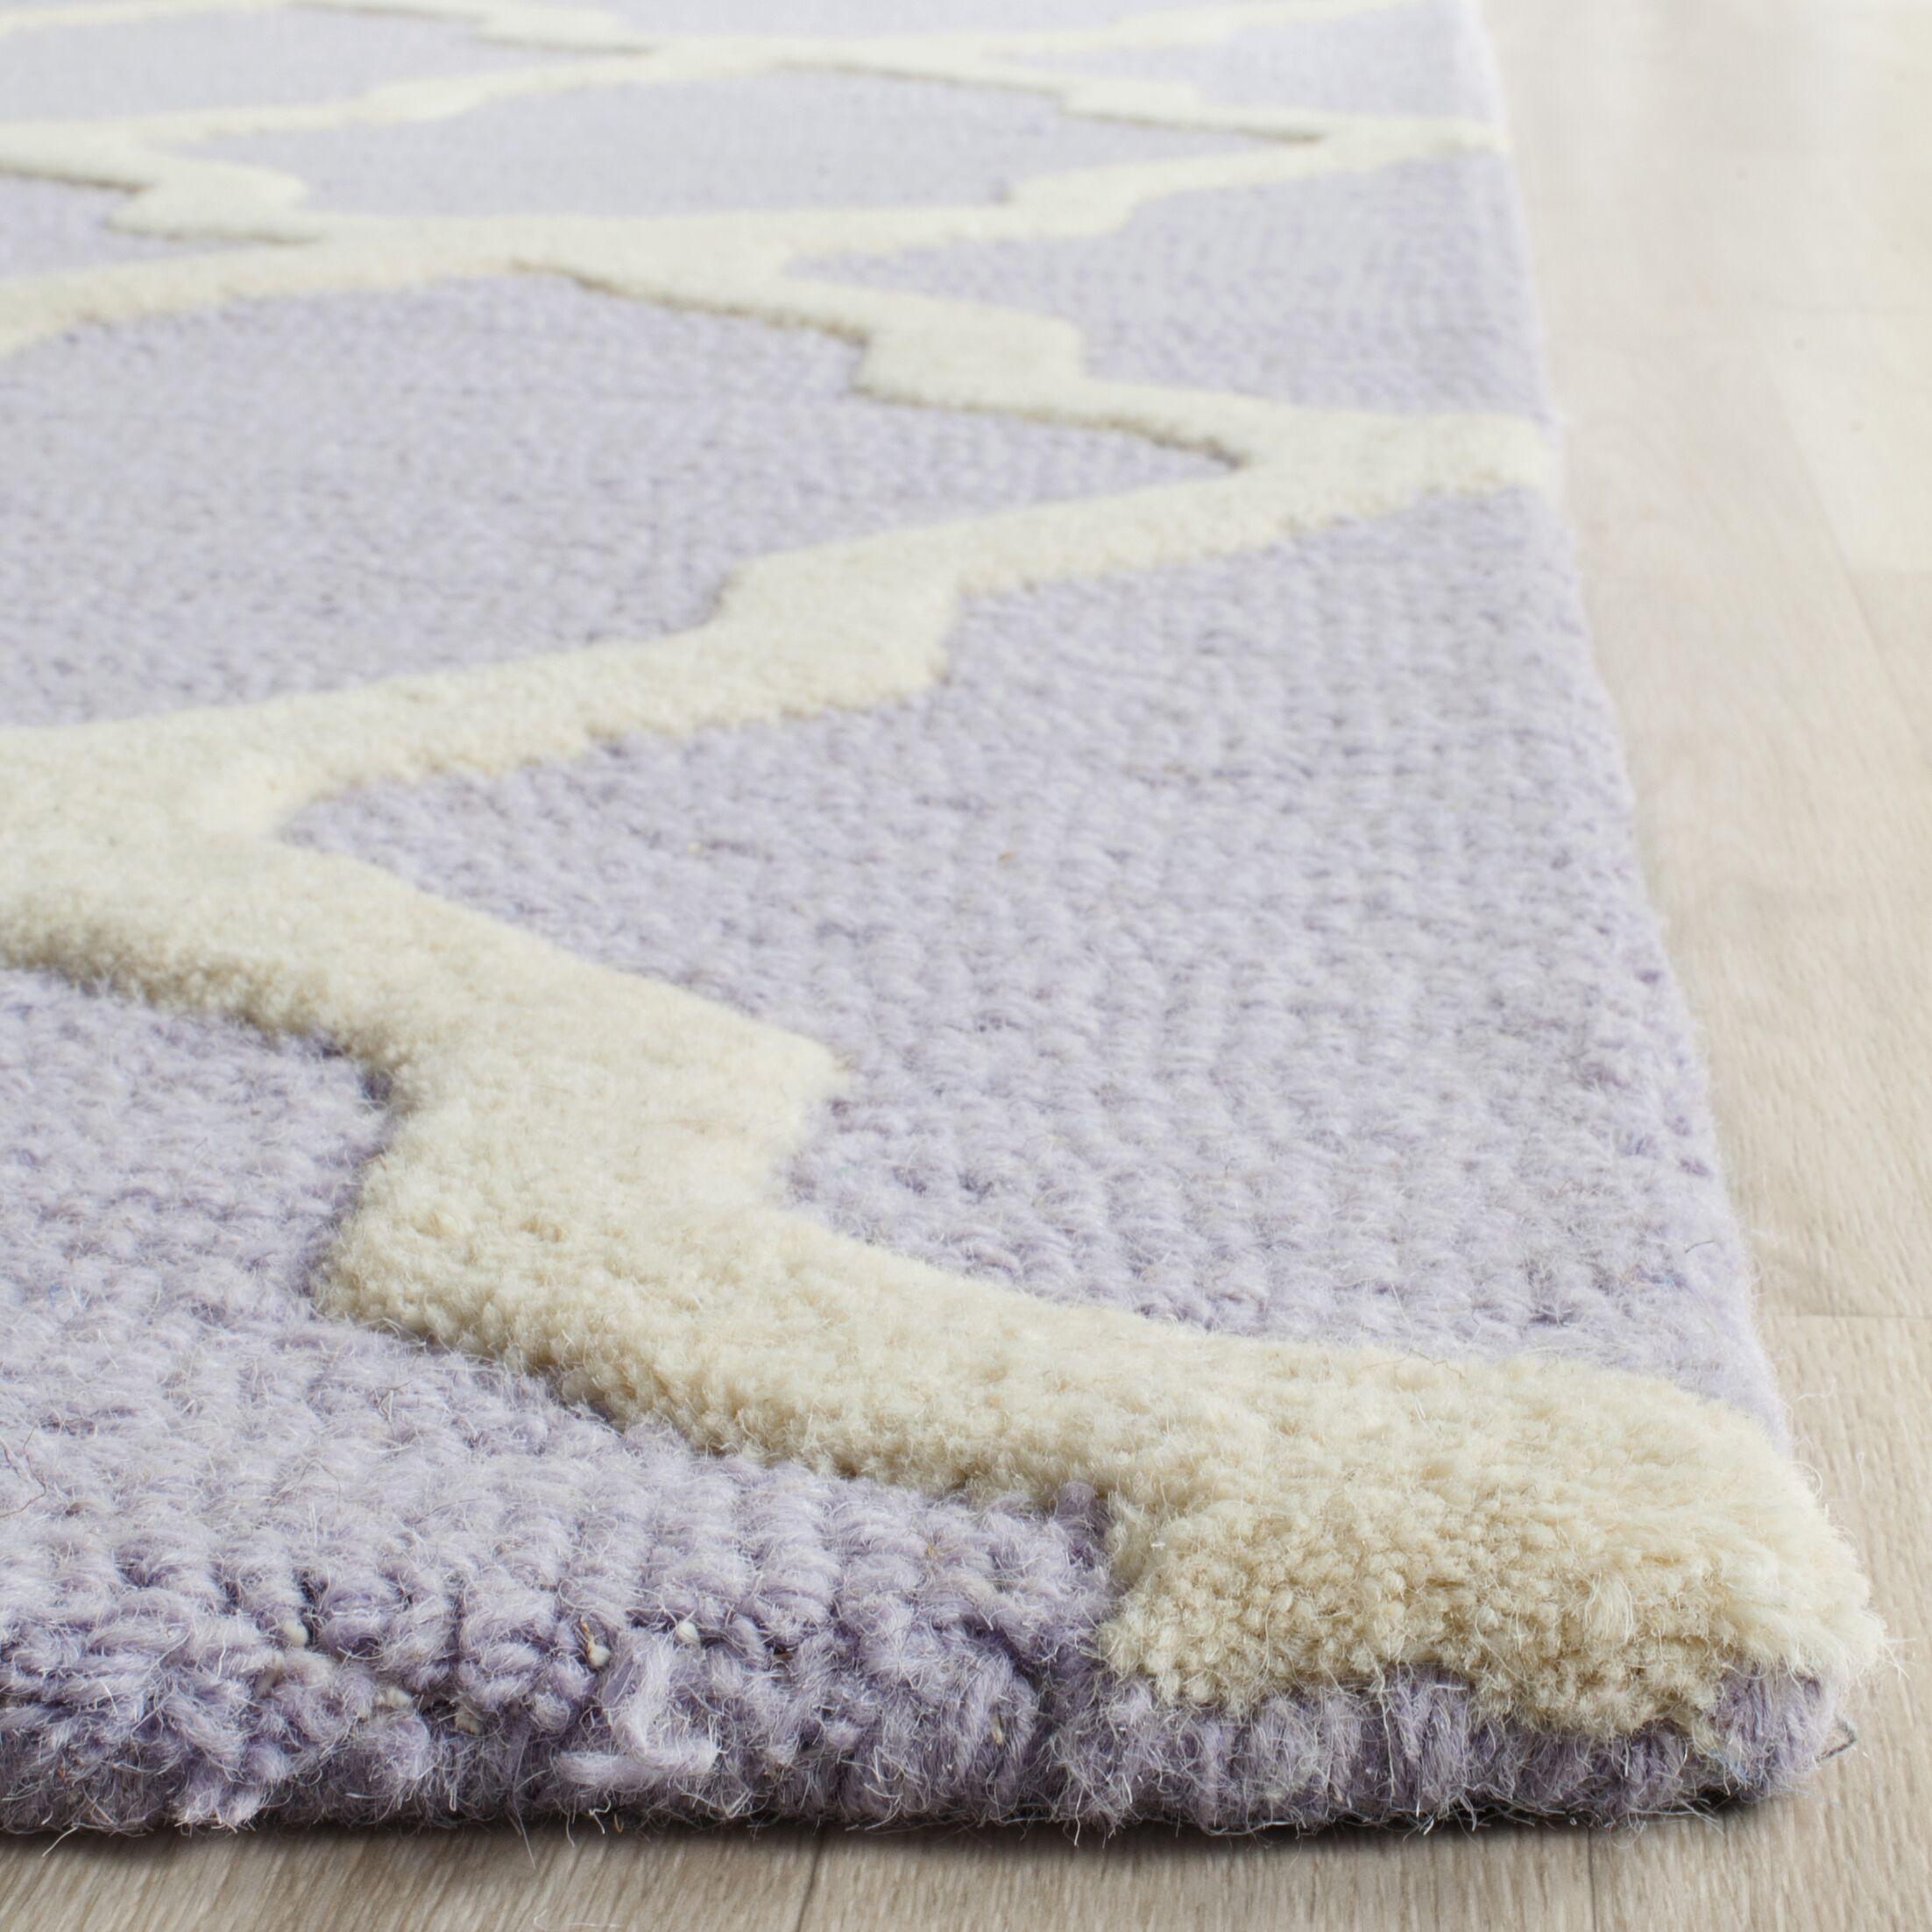 Charlenne Hand-Tufted Lavender/Ivory Area Rug Rug Size: Rectangle 5' x 8'